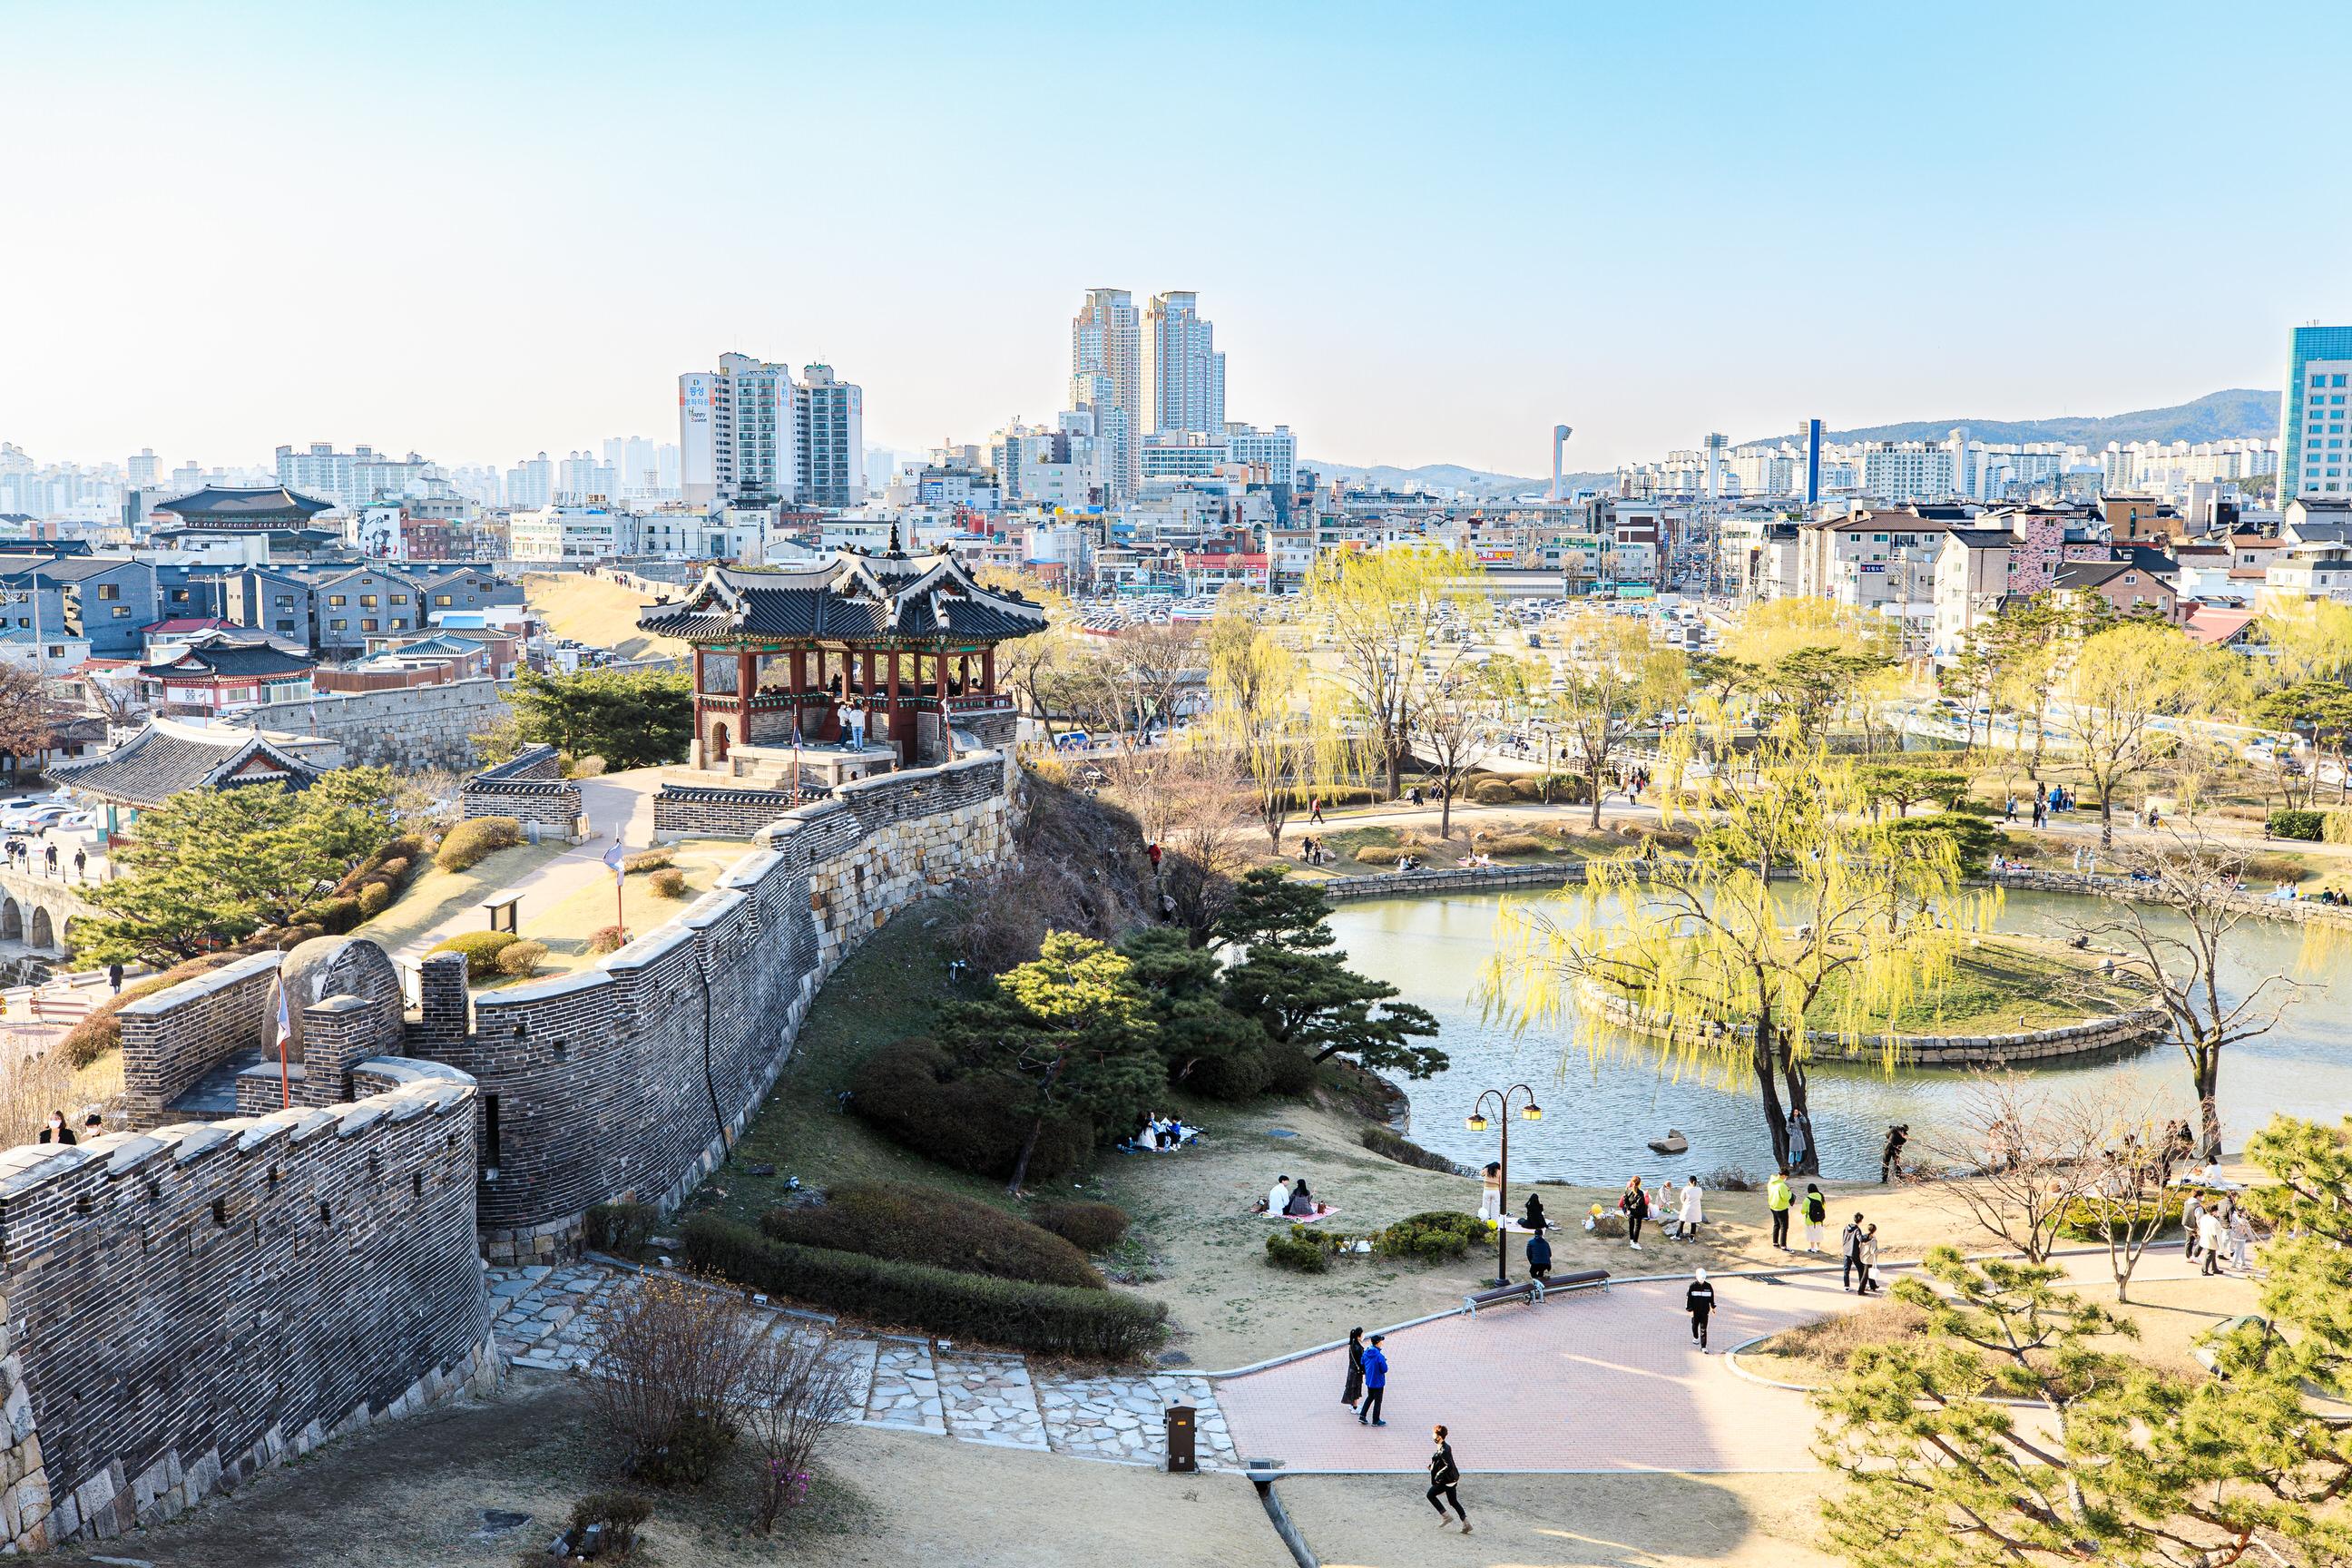 Banghwasuryujeong and Yongyeon Pond